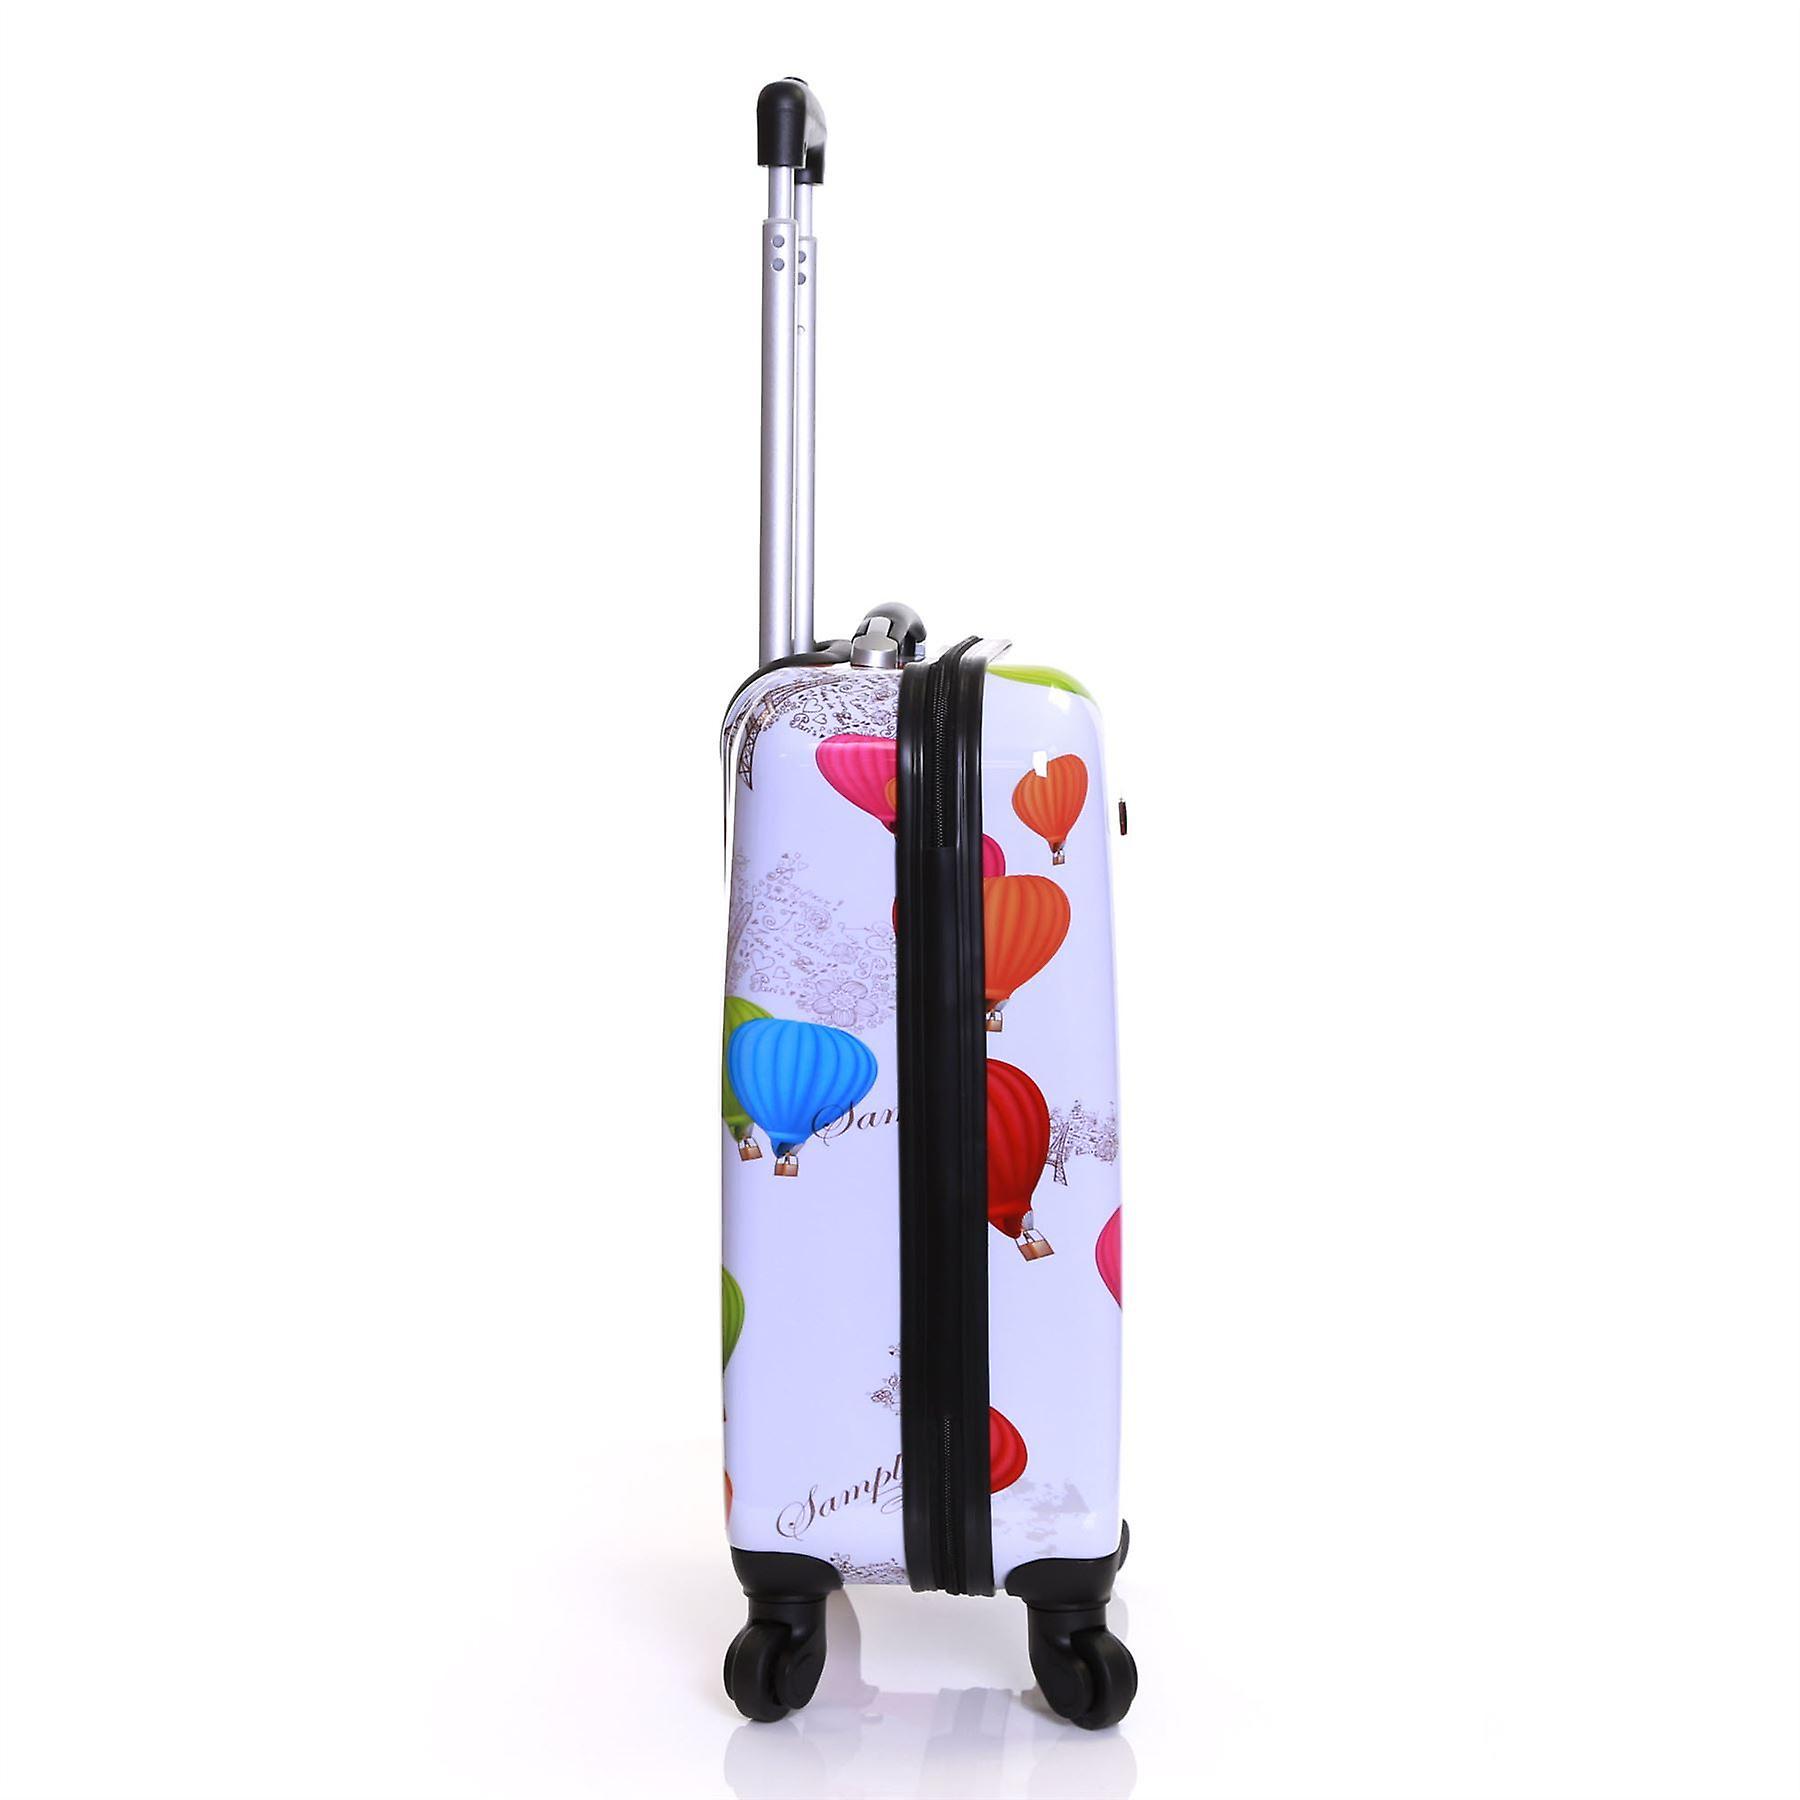 Karabar Dewberry 55 cm Hard Suitcase, Balloons